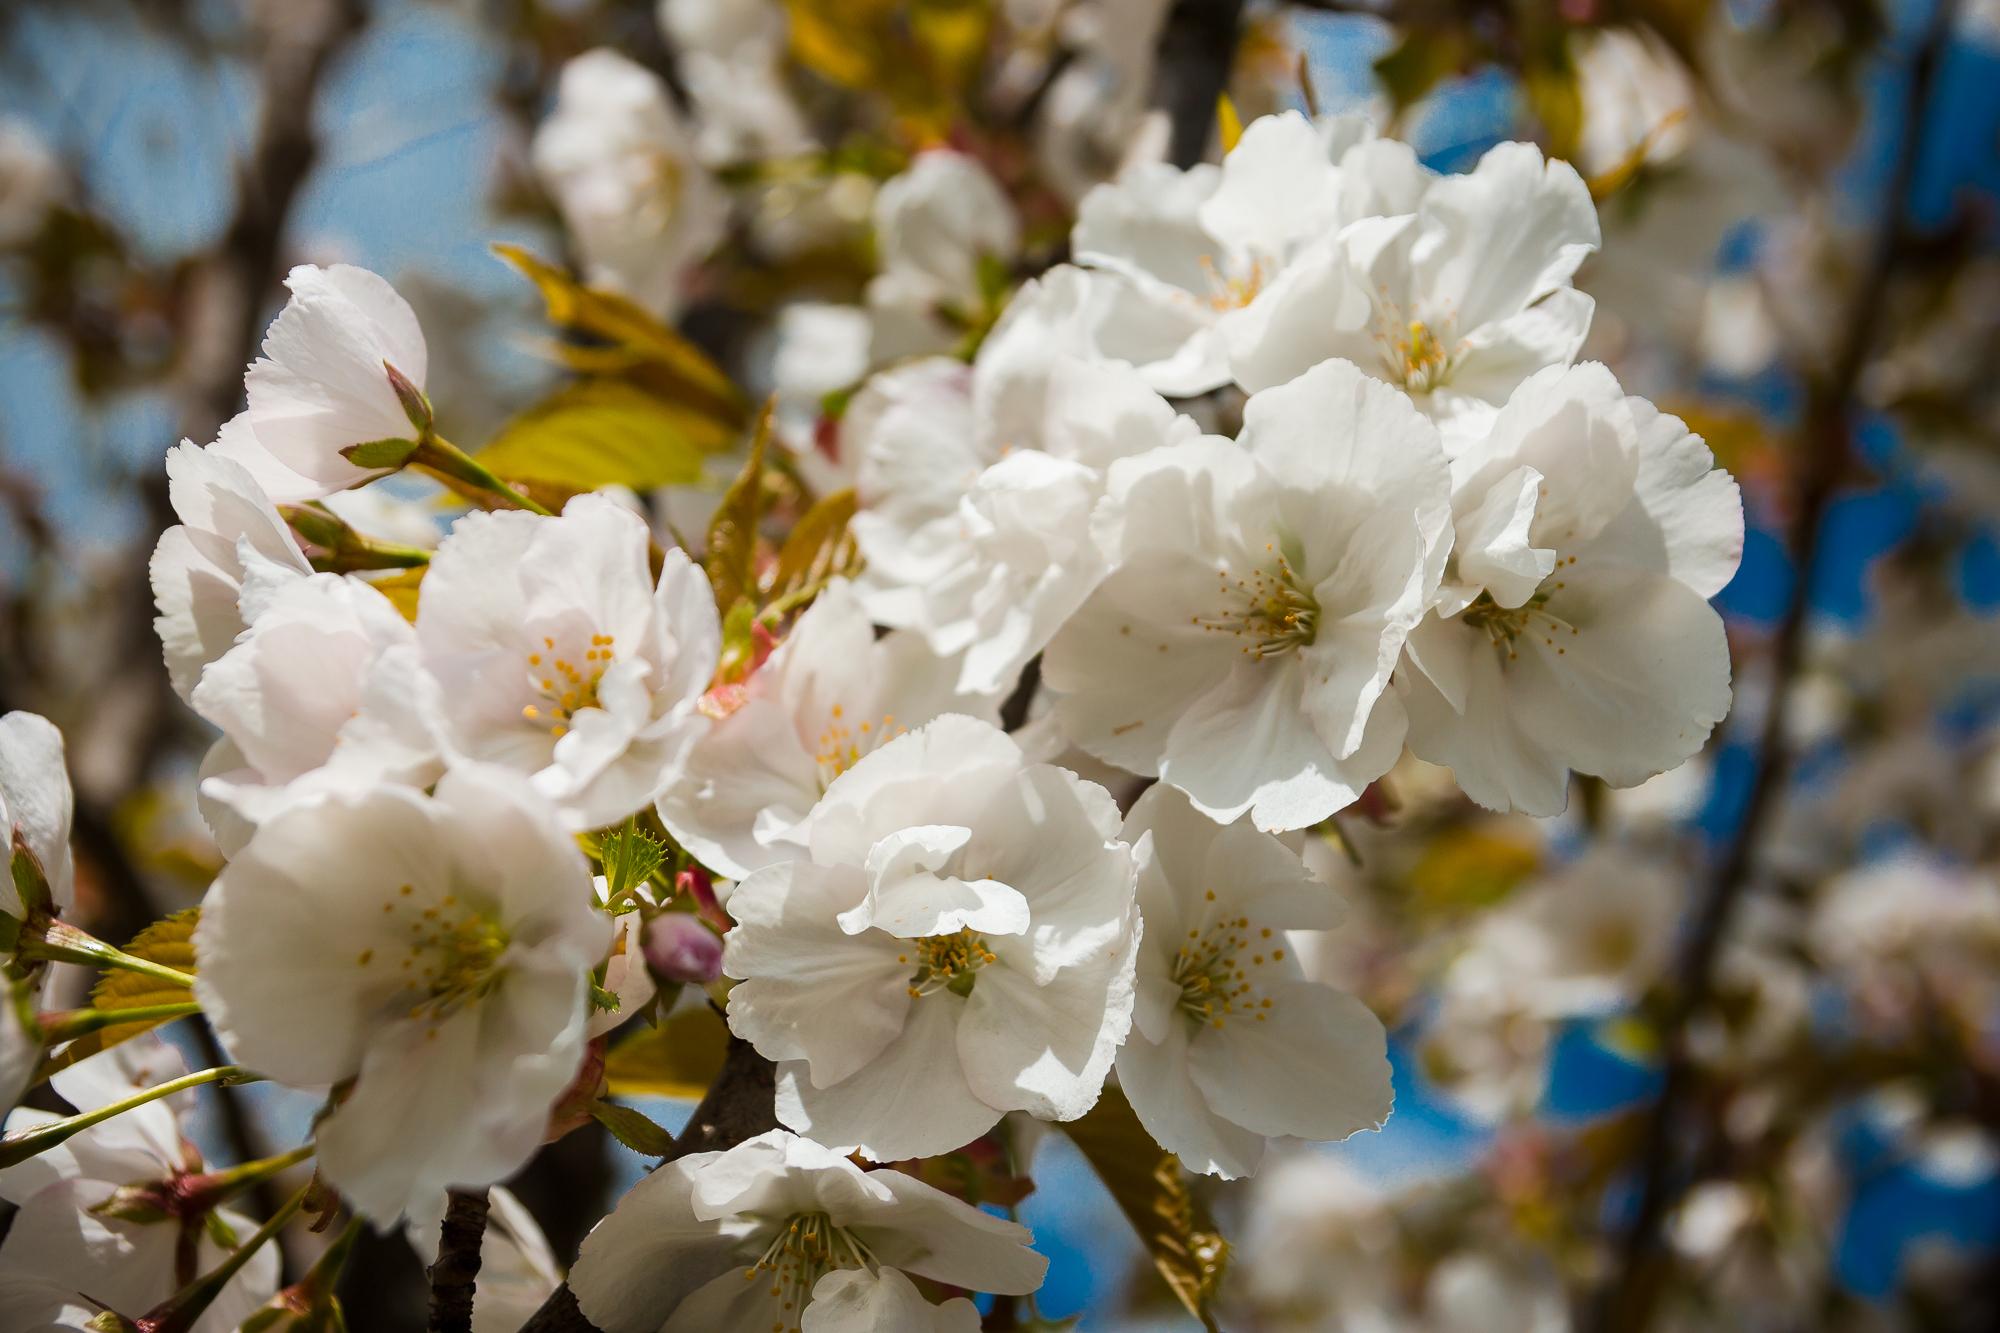 Blossoms Via @Atisgailis